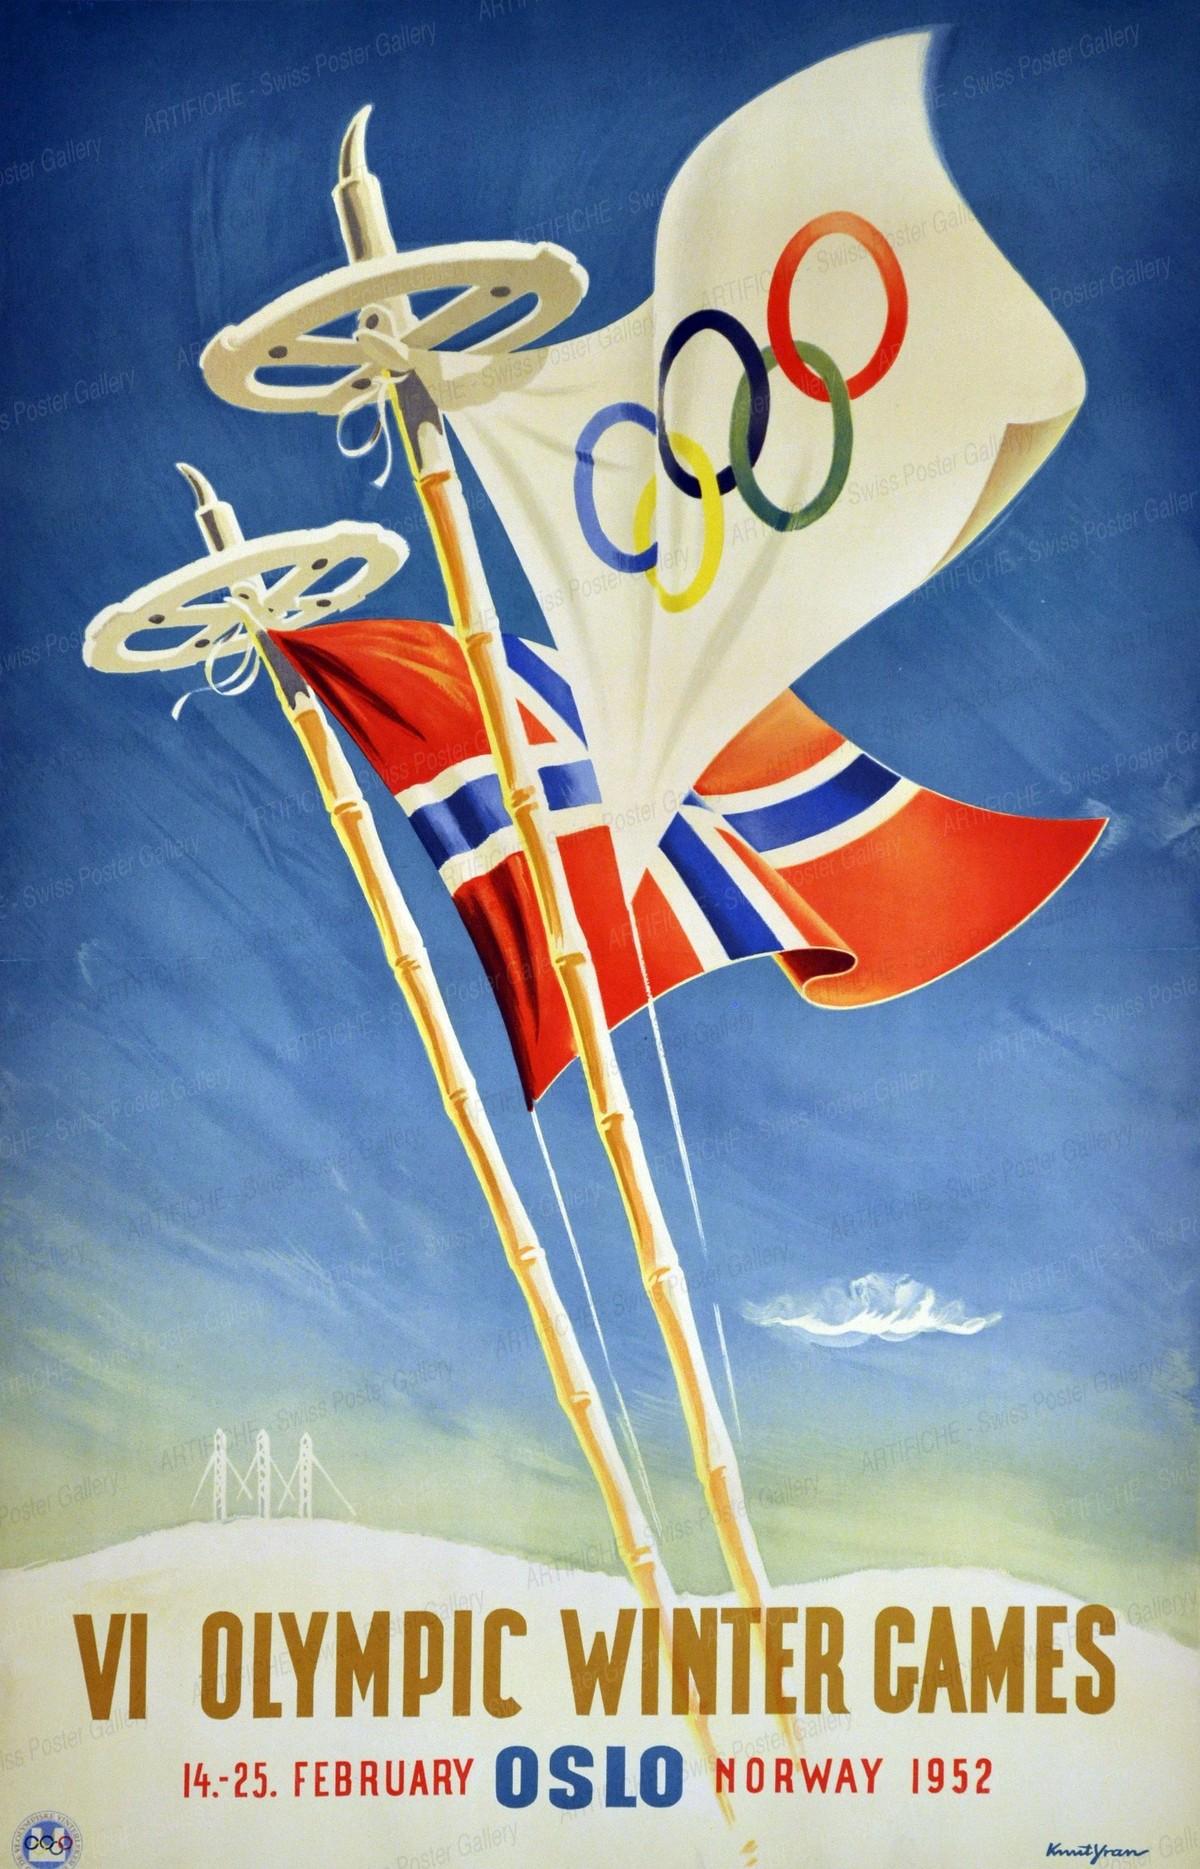 VI Olympic Winter Games 14. – 25. February OSLO Norway 1952, Knut Yran